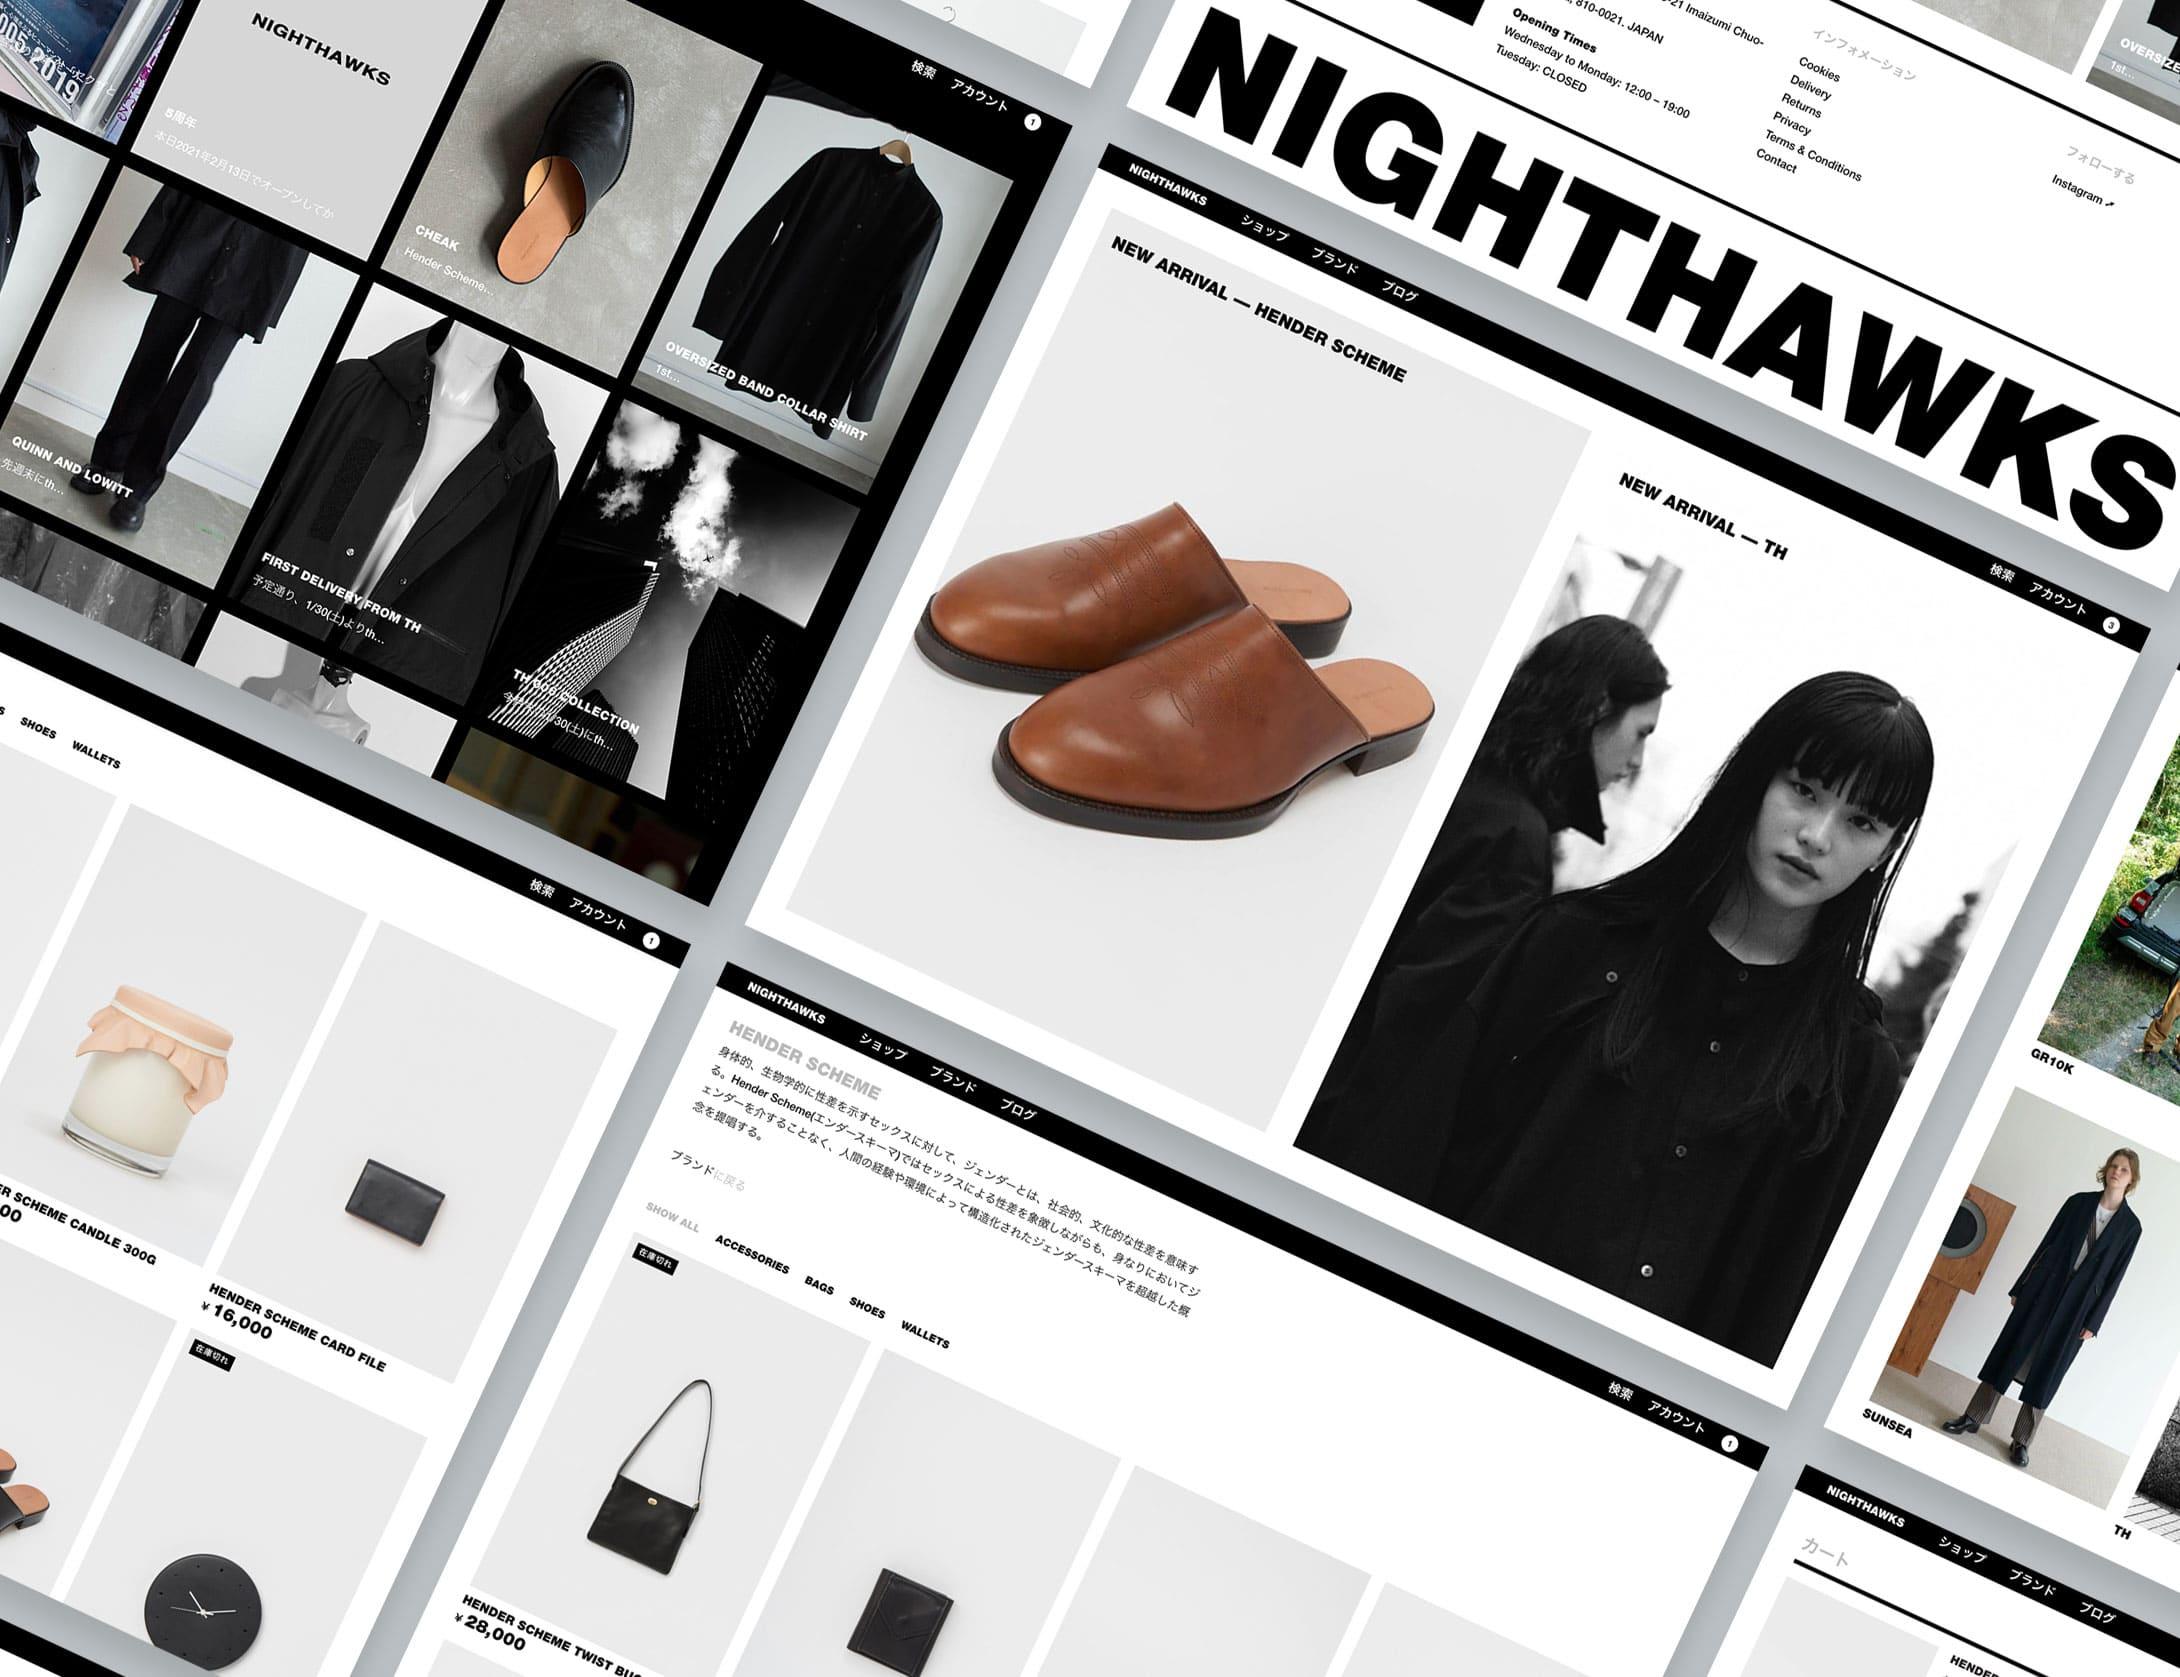 nighthawks-ecommerce-dazze-website